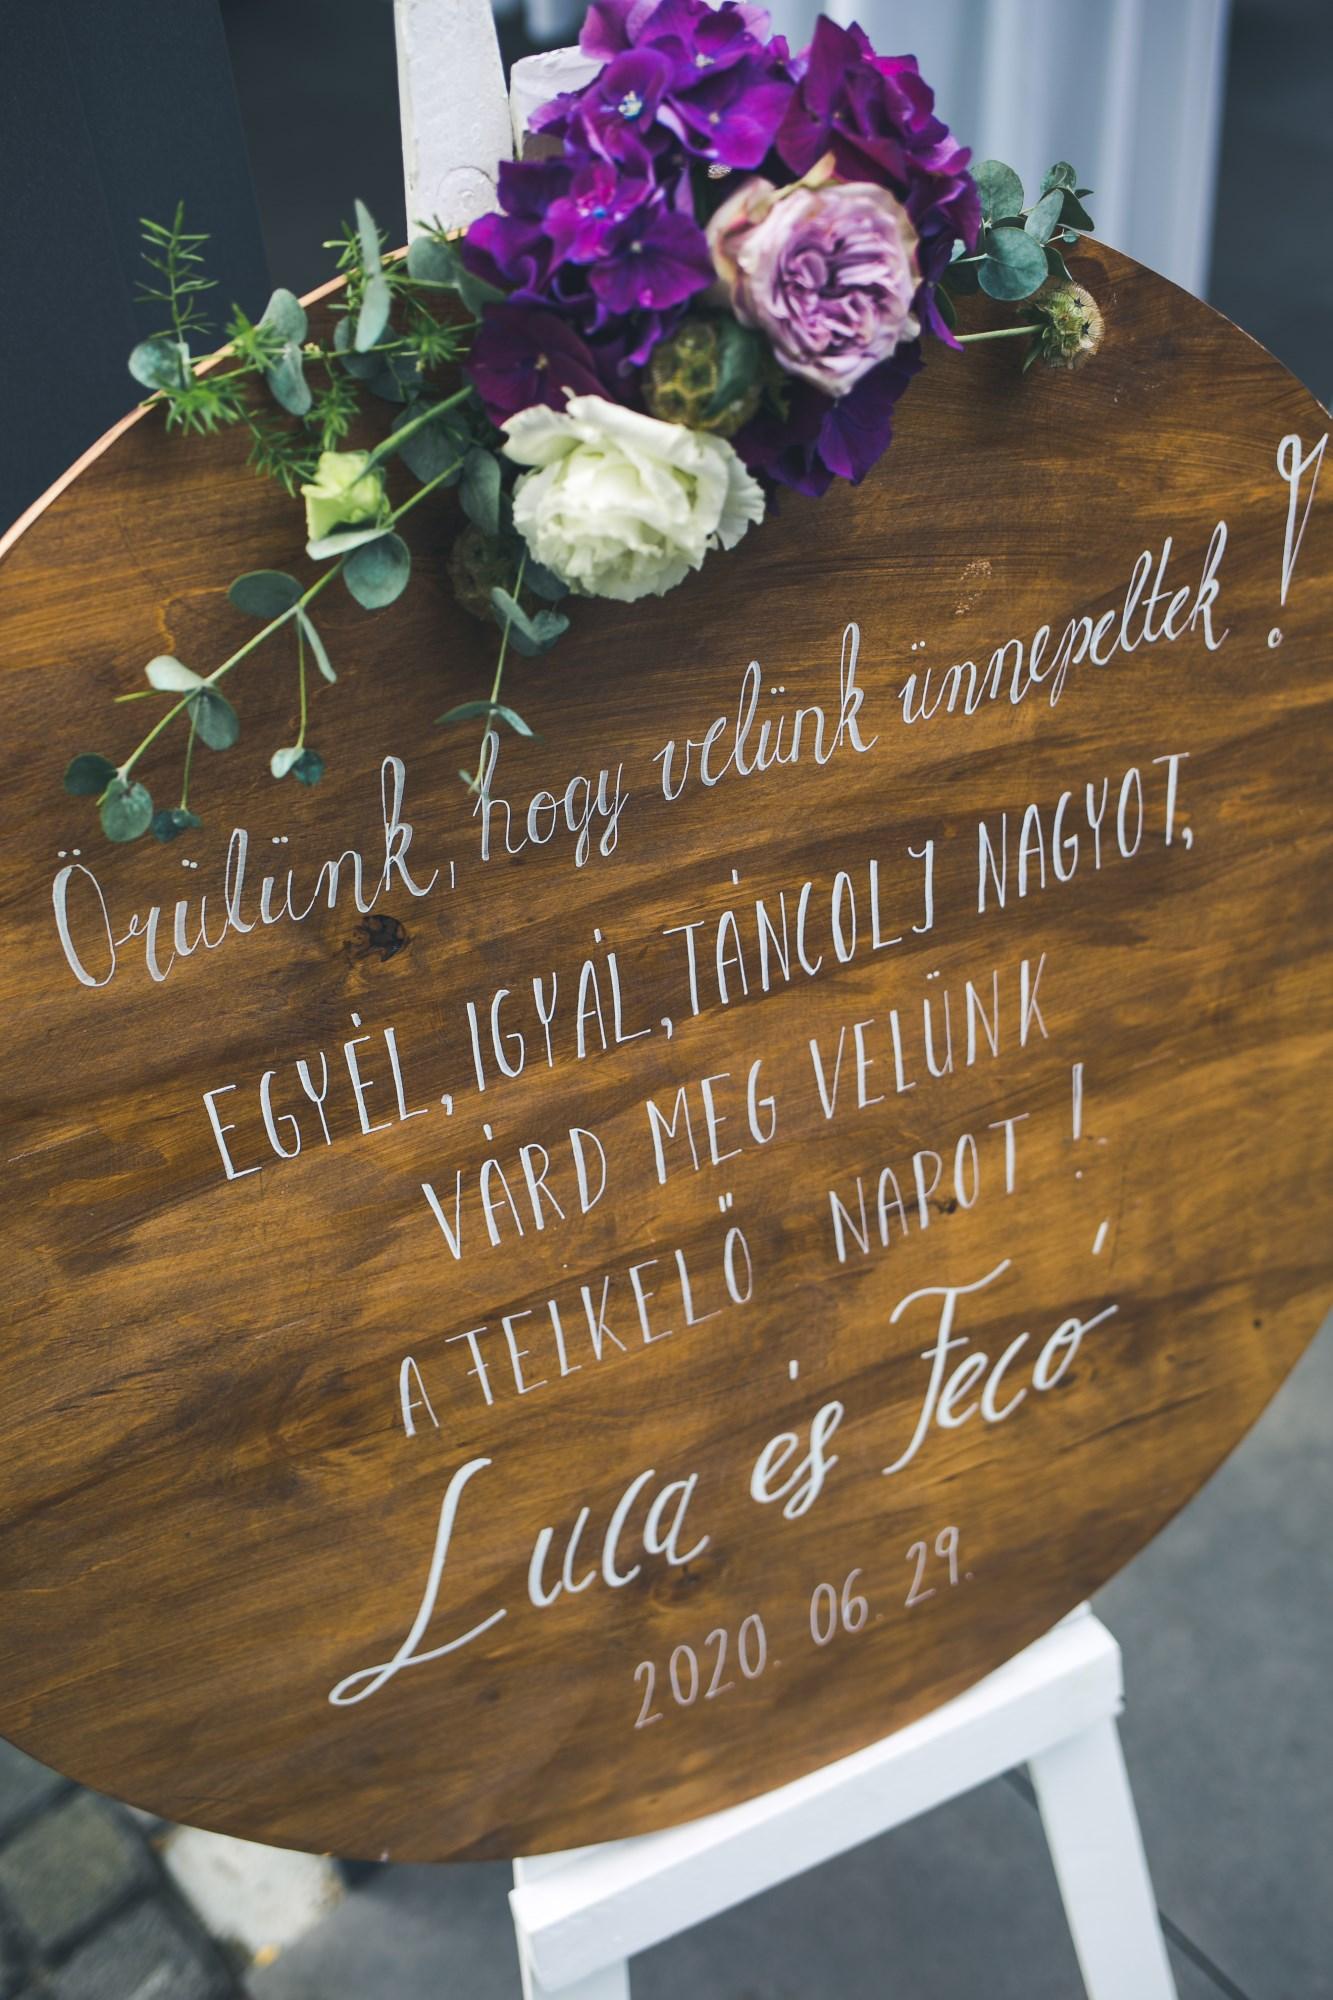 lakeside_wedding_topart_hotel_es_etterem_koszonto_virag_dekoracio